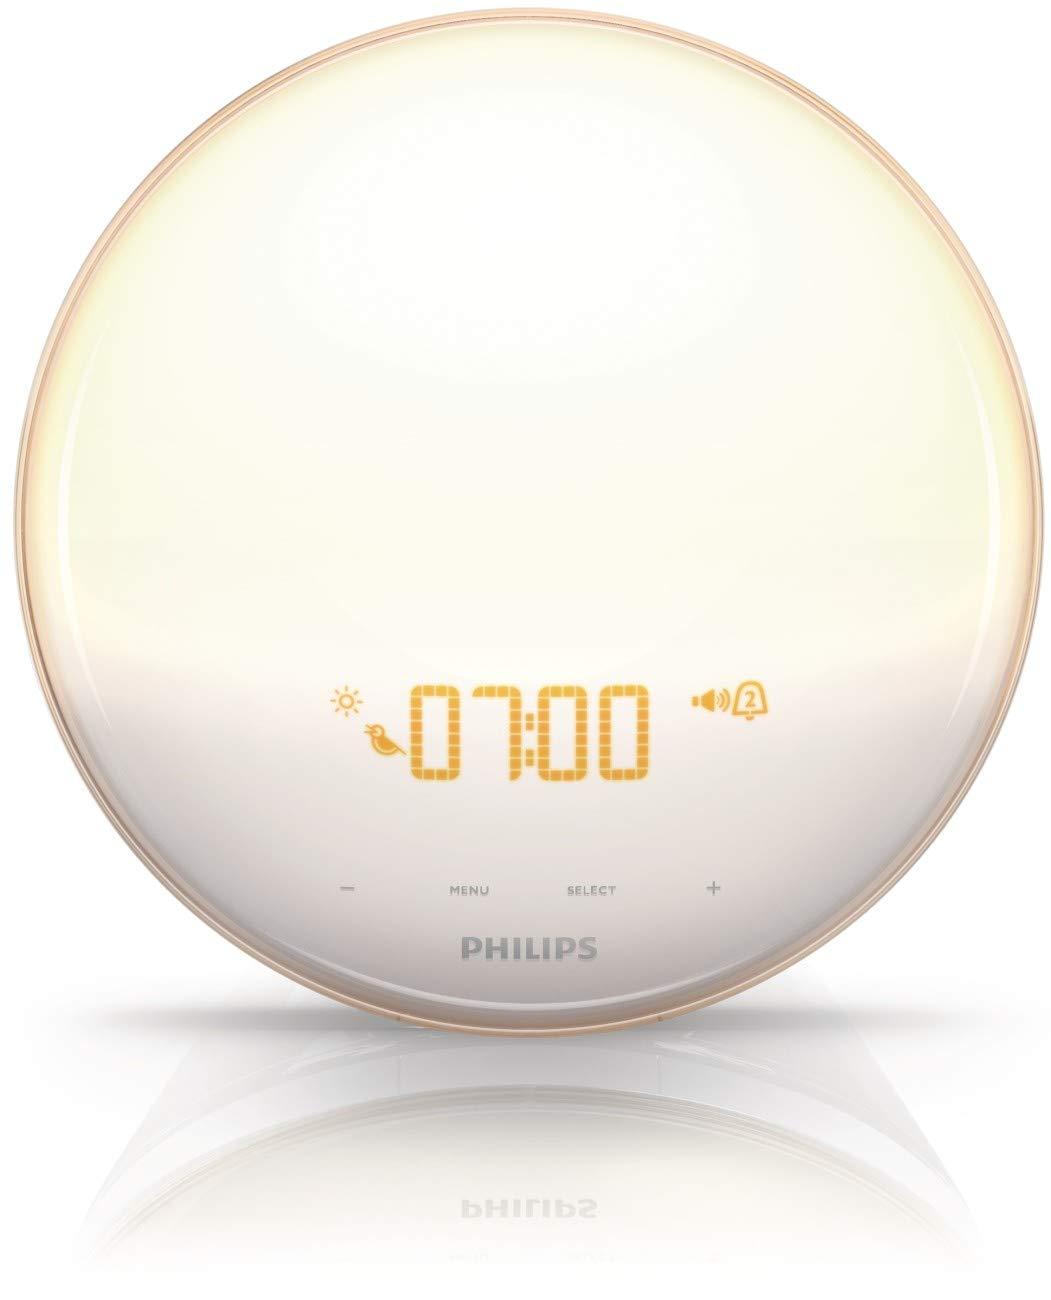 Philips SmartSleep Wake-up Light, Colored Sunrise and Sunset Simulation, 5 Natural Sounds, FM Radio & Reading Lamp, Tap…